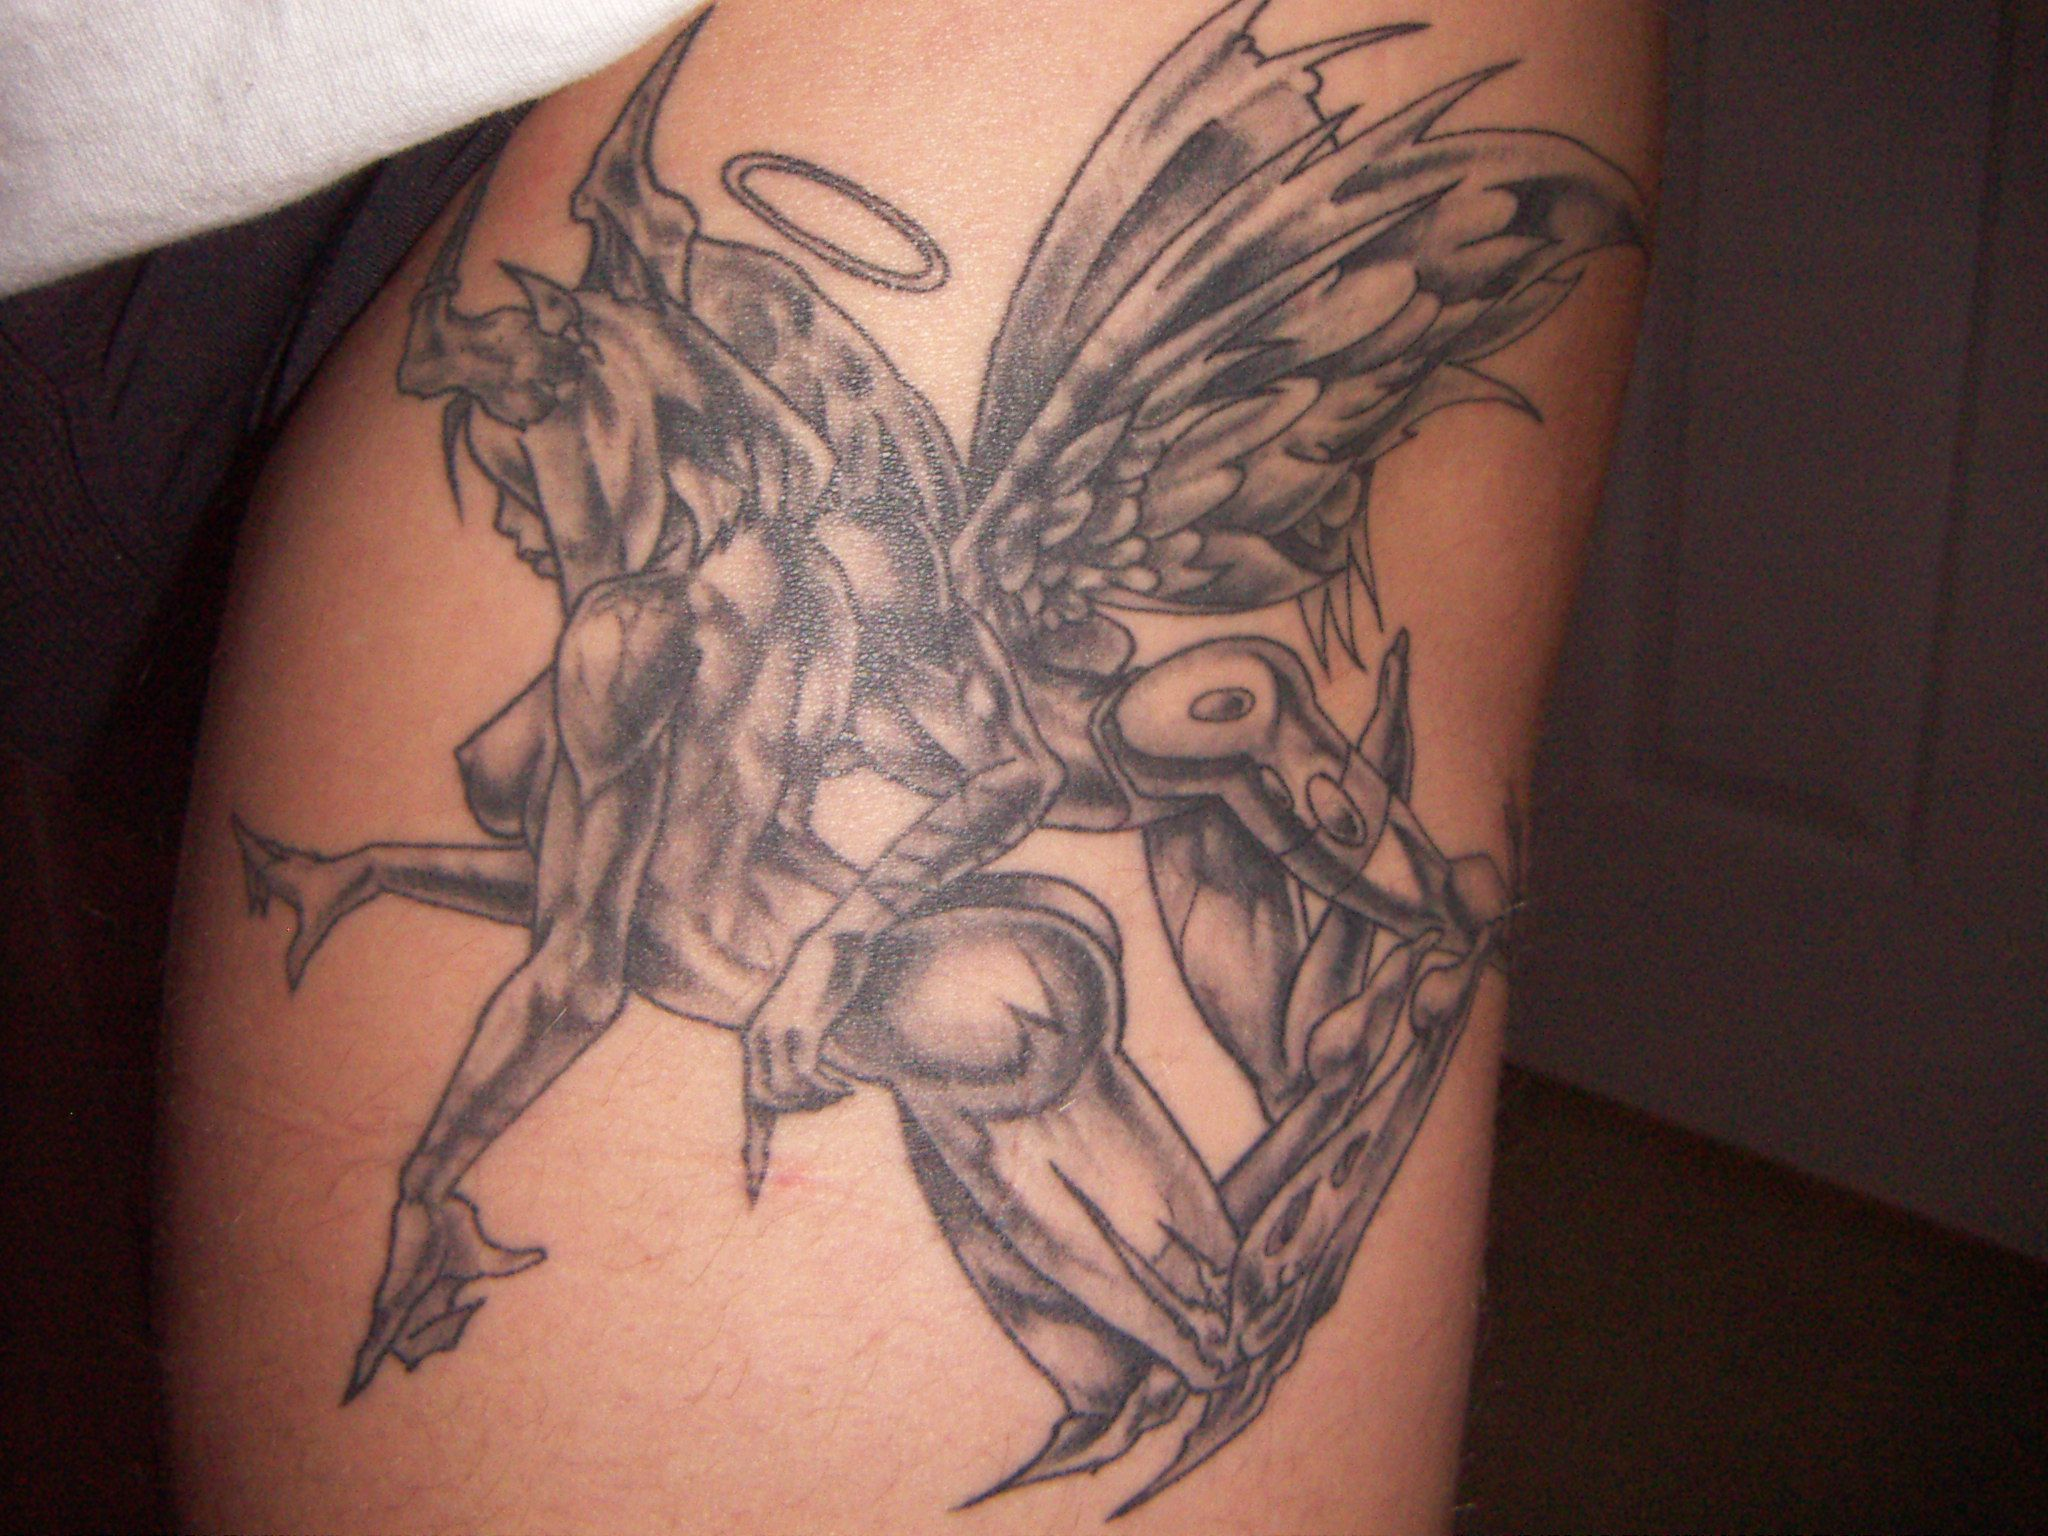 Gemini Tattoos Angel And Devil | www.pixshark.com - Images ...